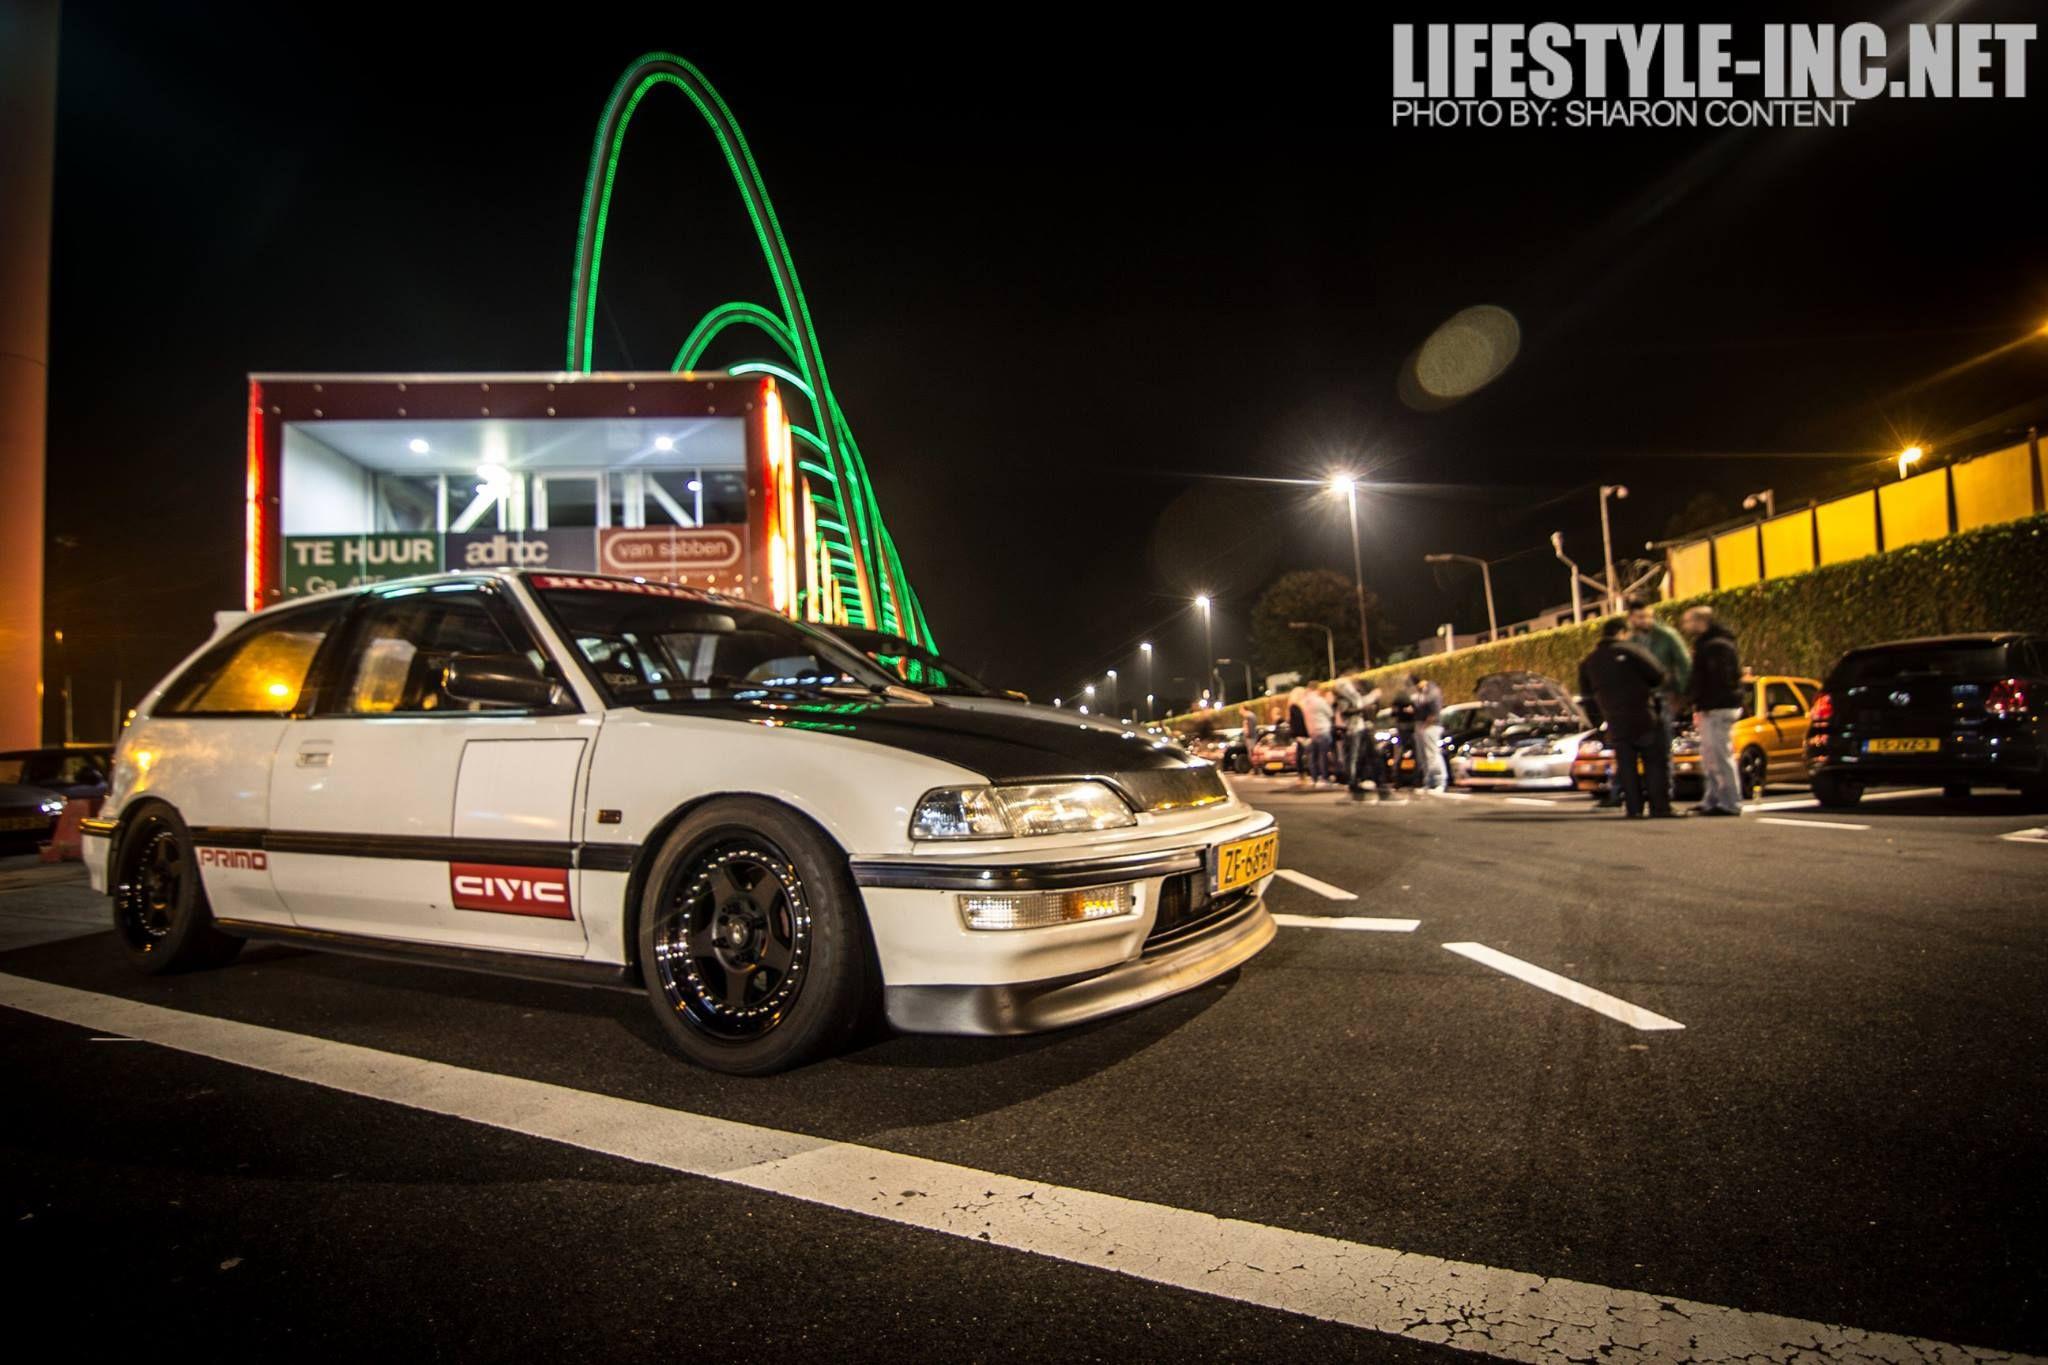 Honda Civic Ef Kanjo Street Racing Style Lifestyle